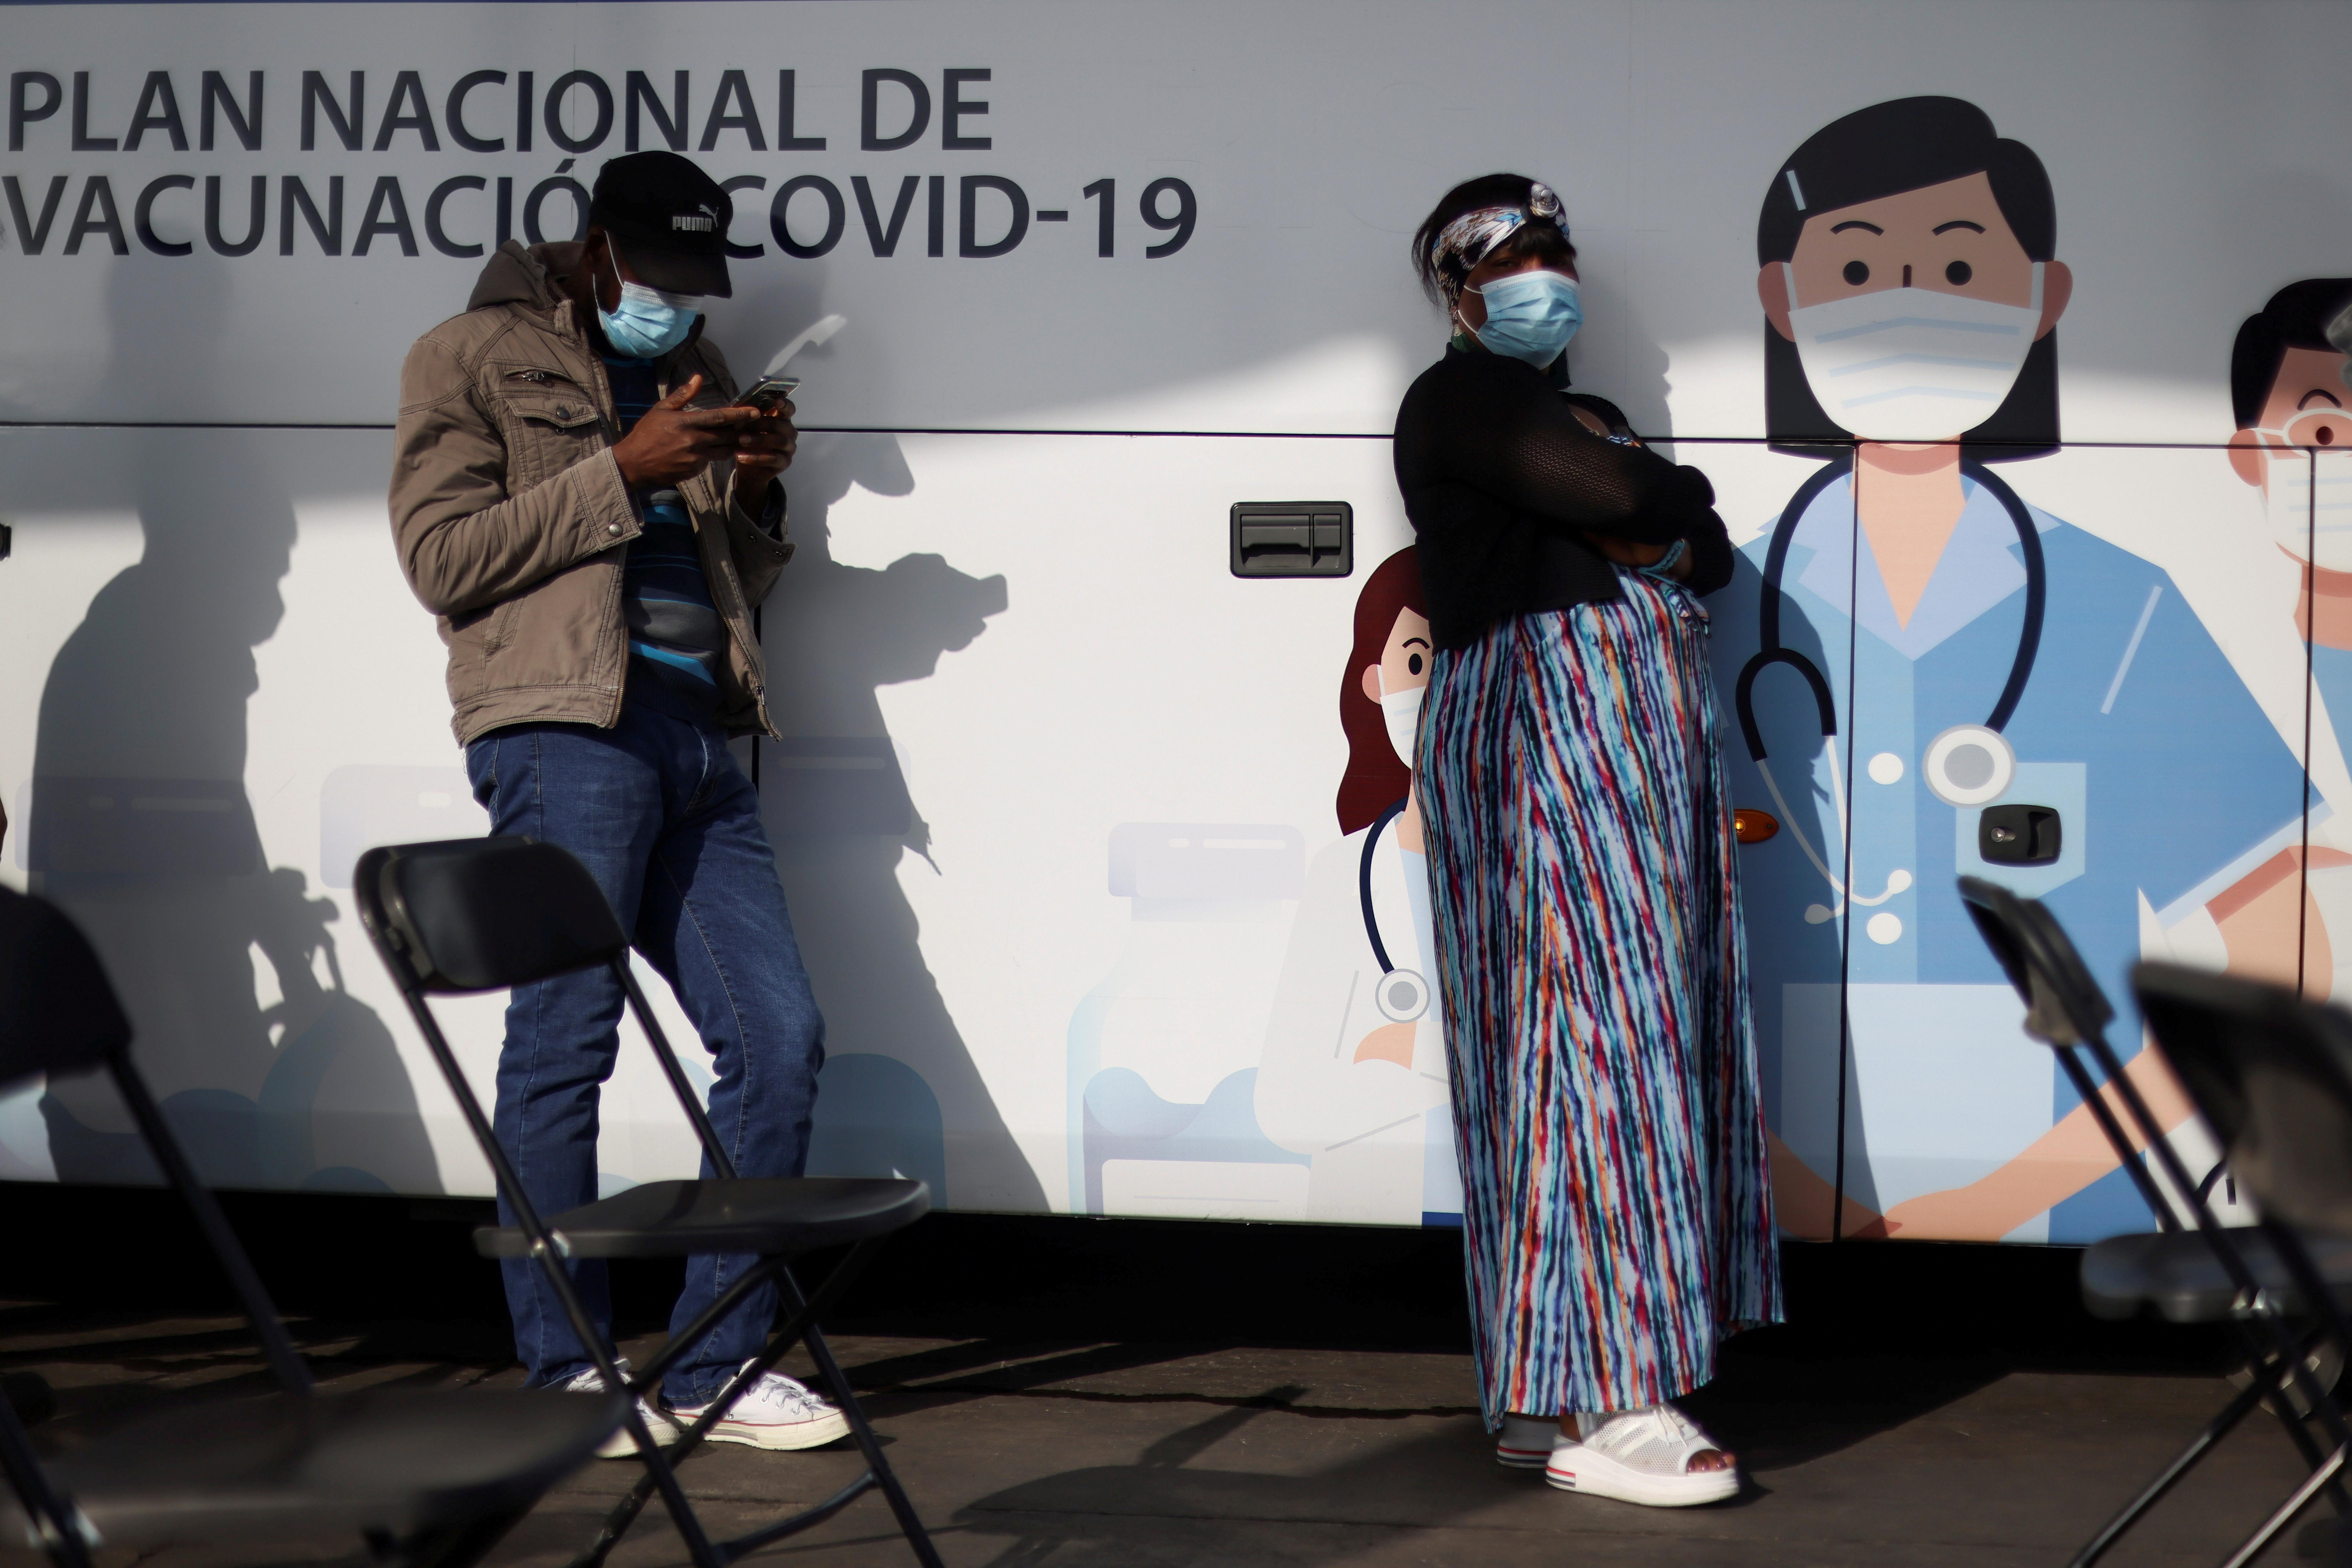 People wait outside a mobile vaccination centre to receive a dose of Sinovac's CoronaVac vaccine against the coronavirus disease (COVID-19) in Santiago, Chile June 16, 2021. REUTERS/Ivan Alvarado